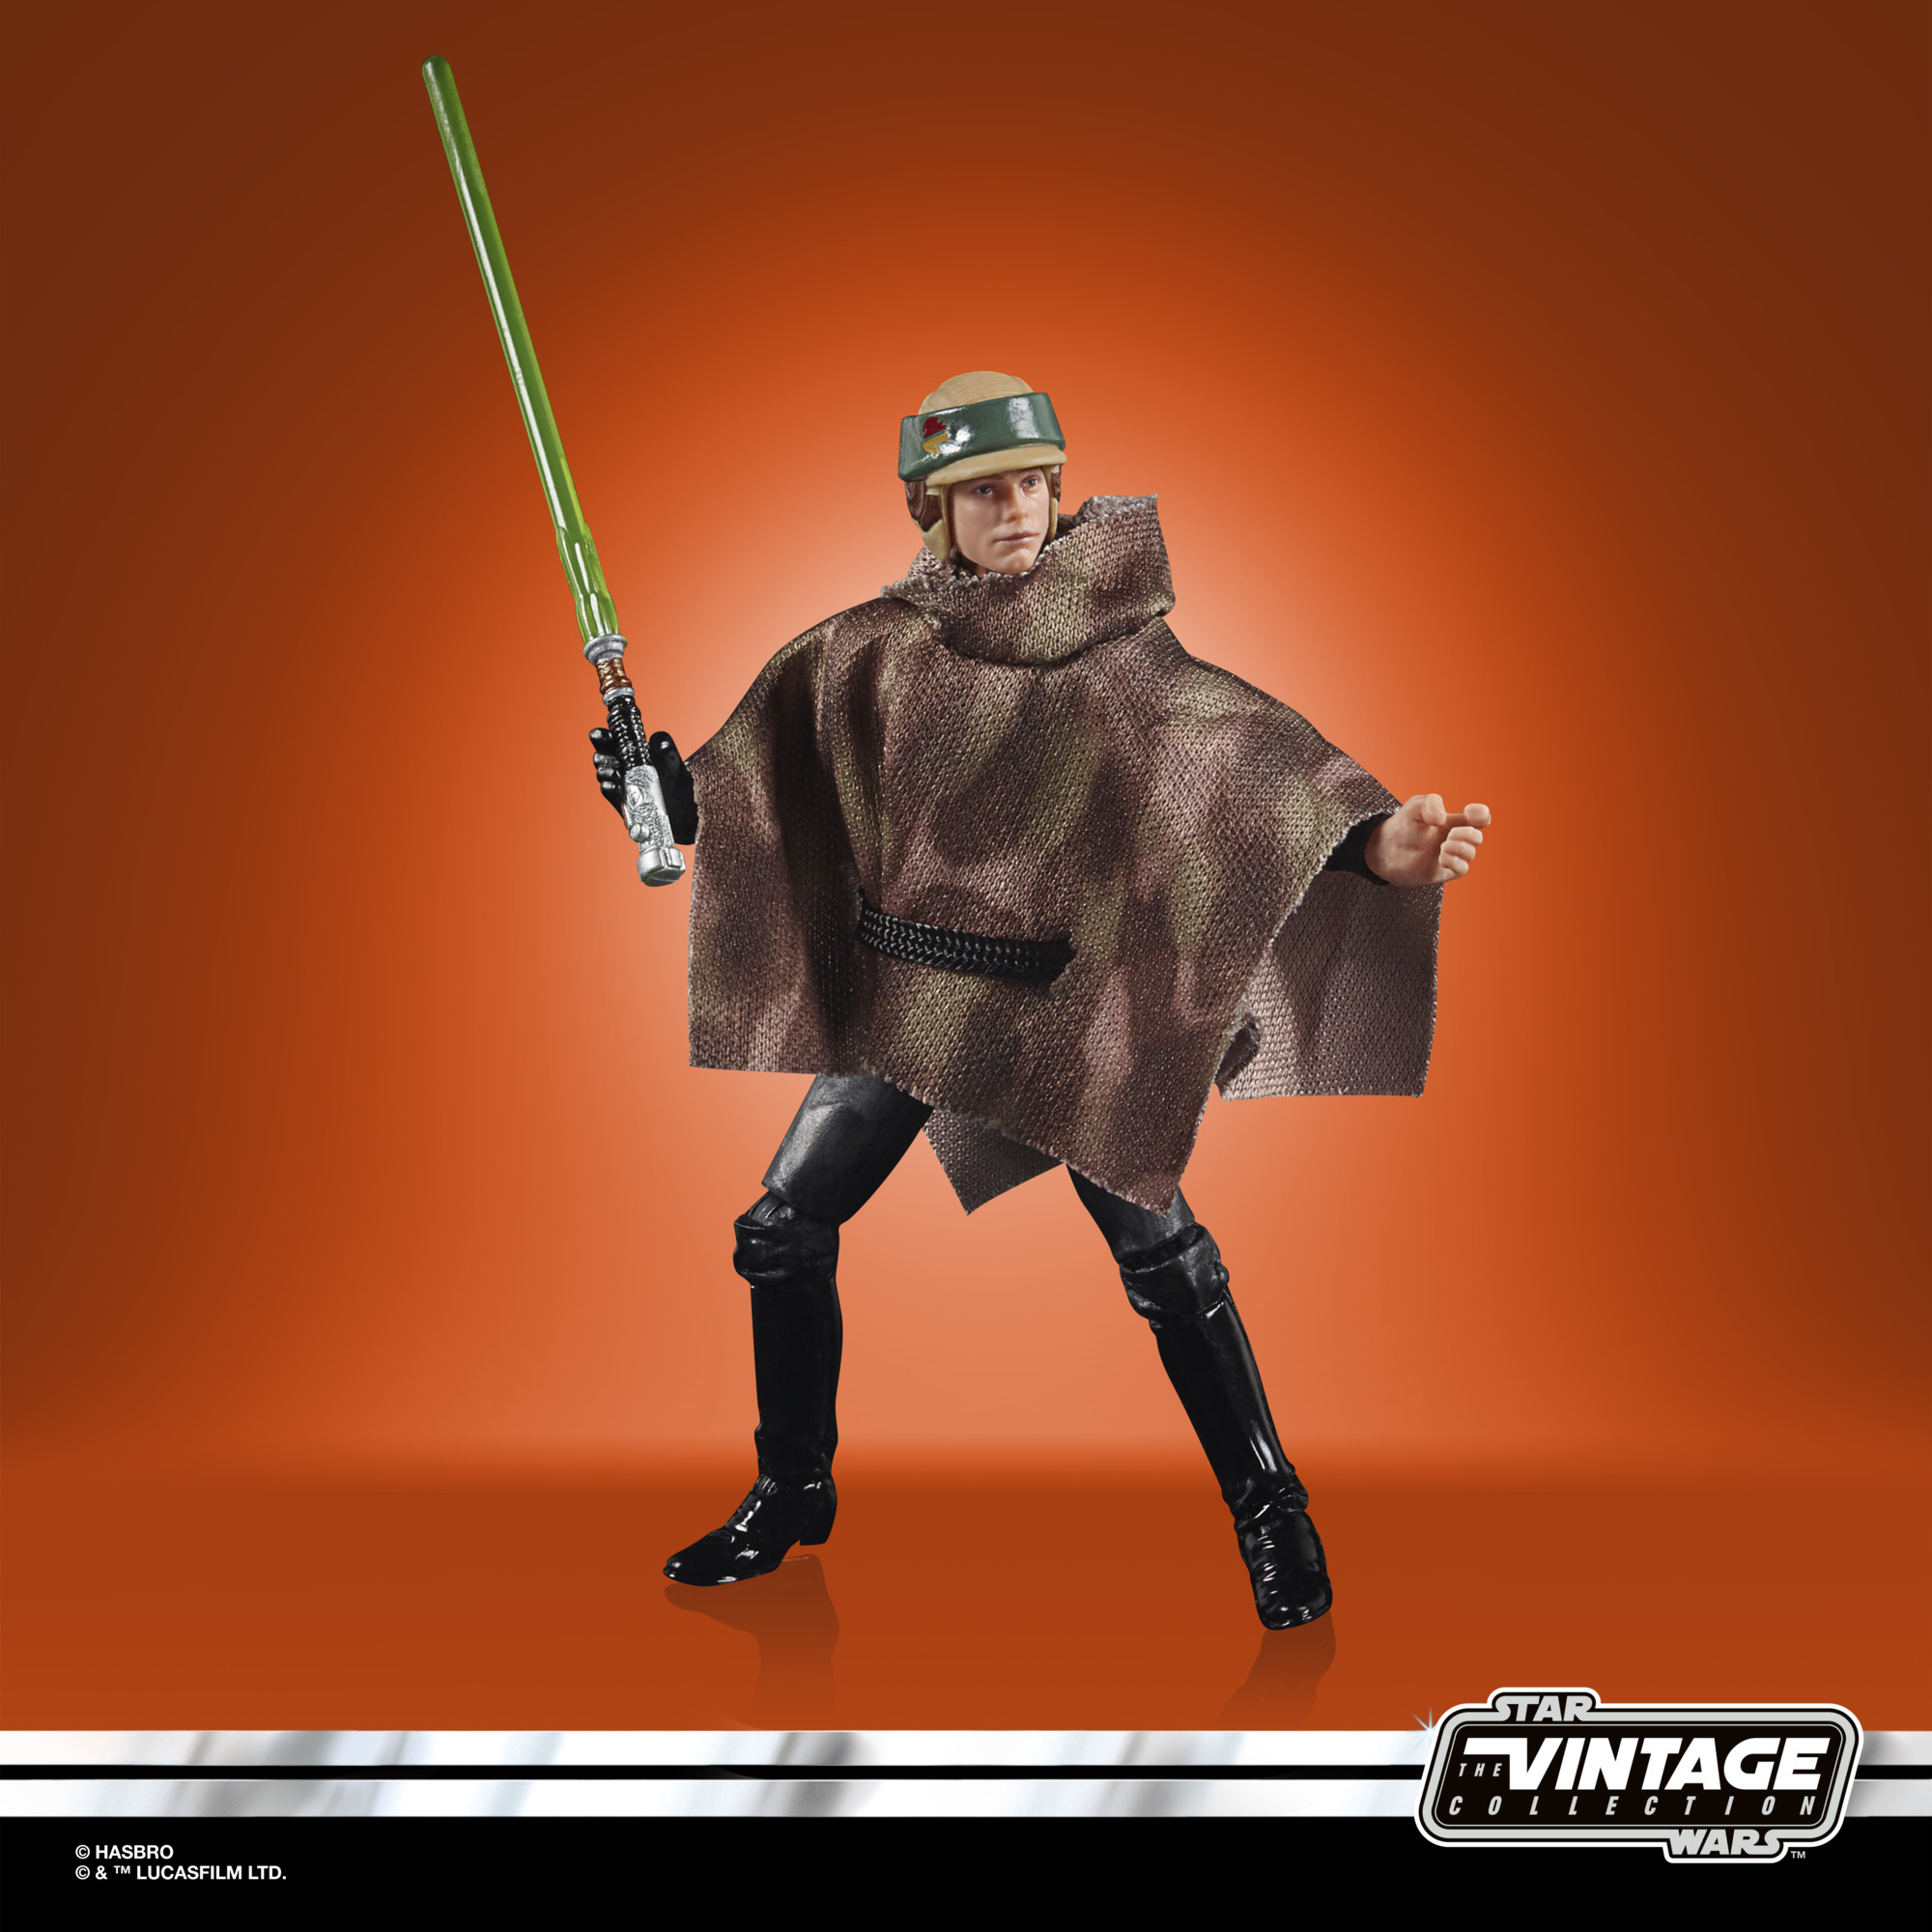 Star Wars The Vintage Collection Luke Skywalker (Endor) LUCASFILM 50TH ANNIVERSARY F31175L0 5010993895182